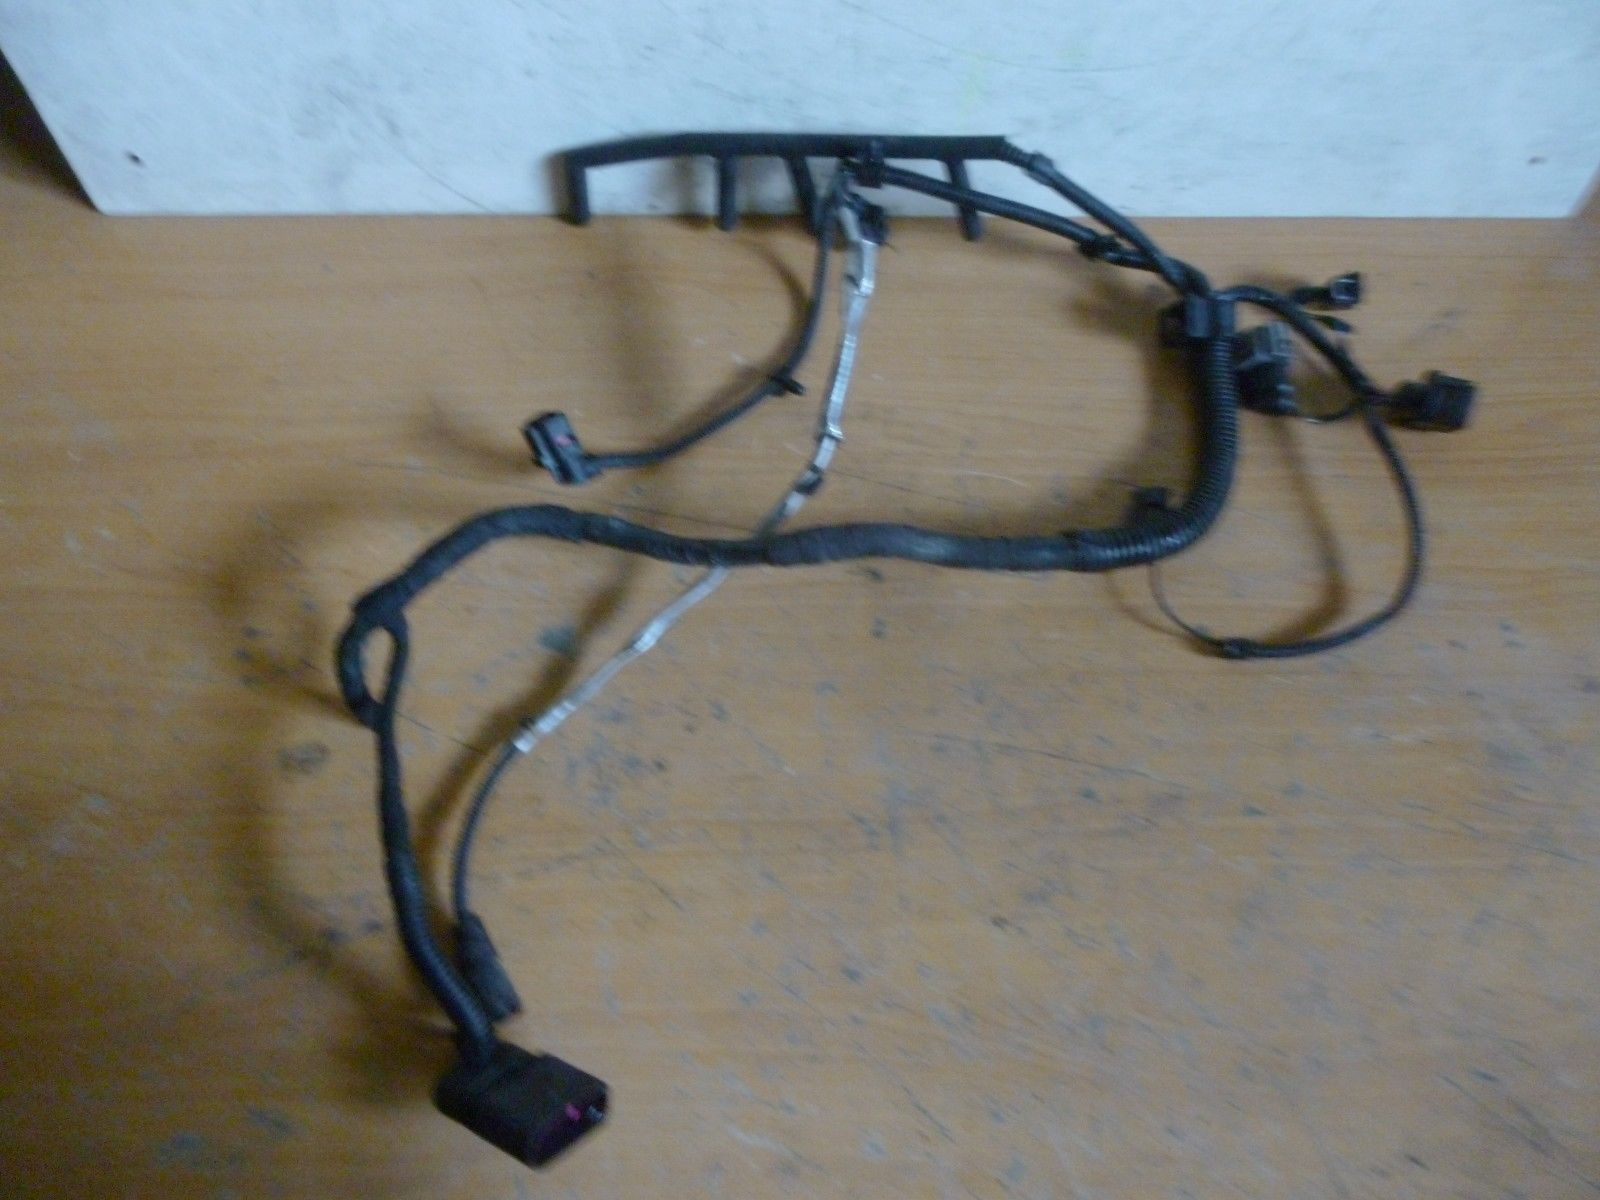 Skoda Octavia Bj.2002 Kabelbaum Kabelstrang 1J0973837 038971220